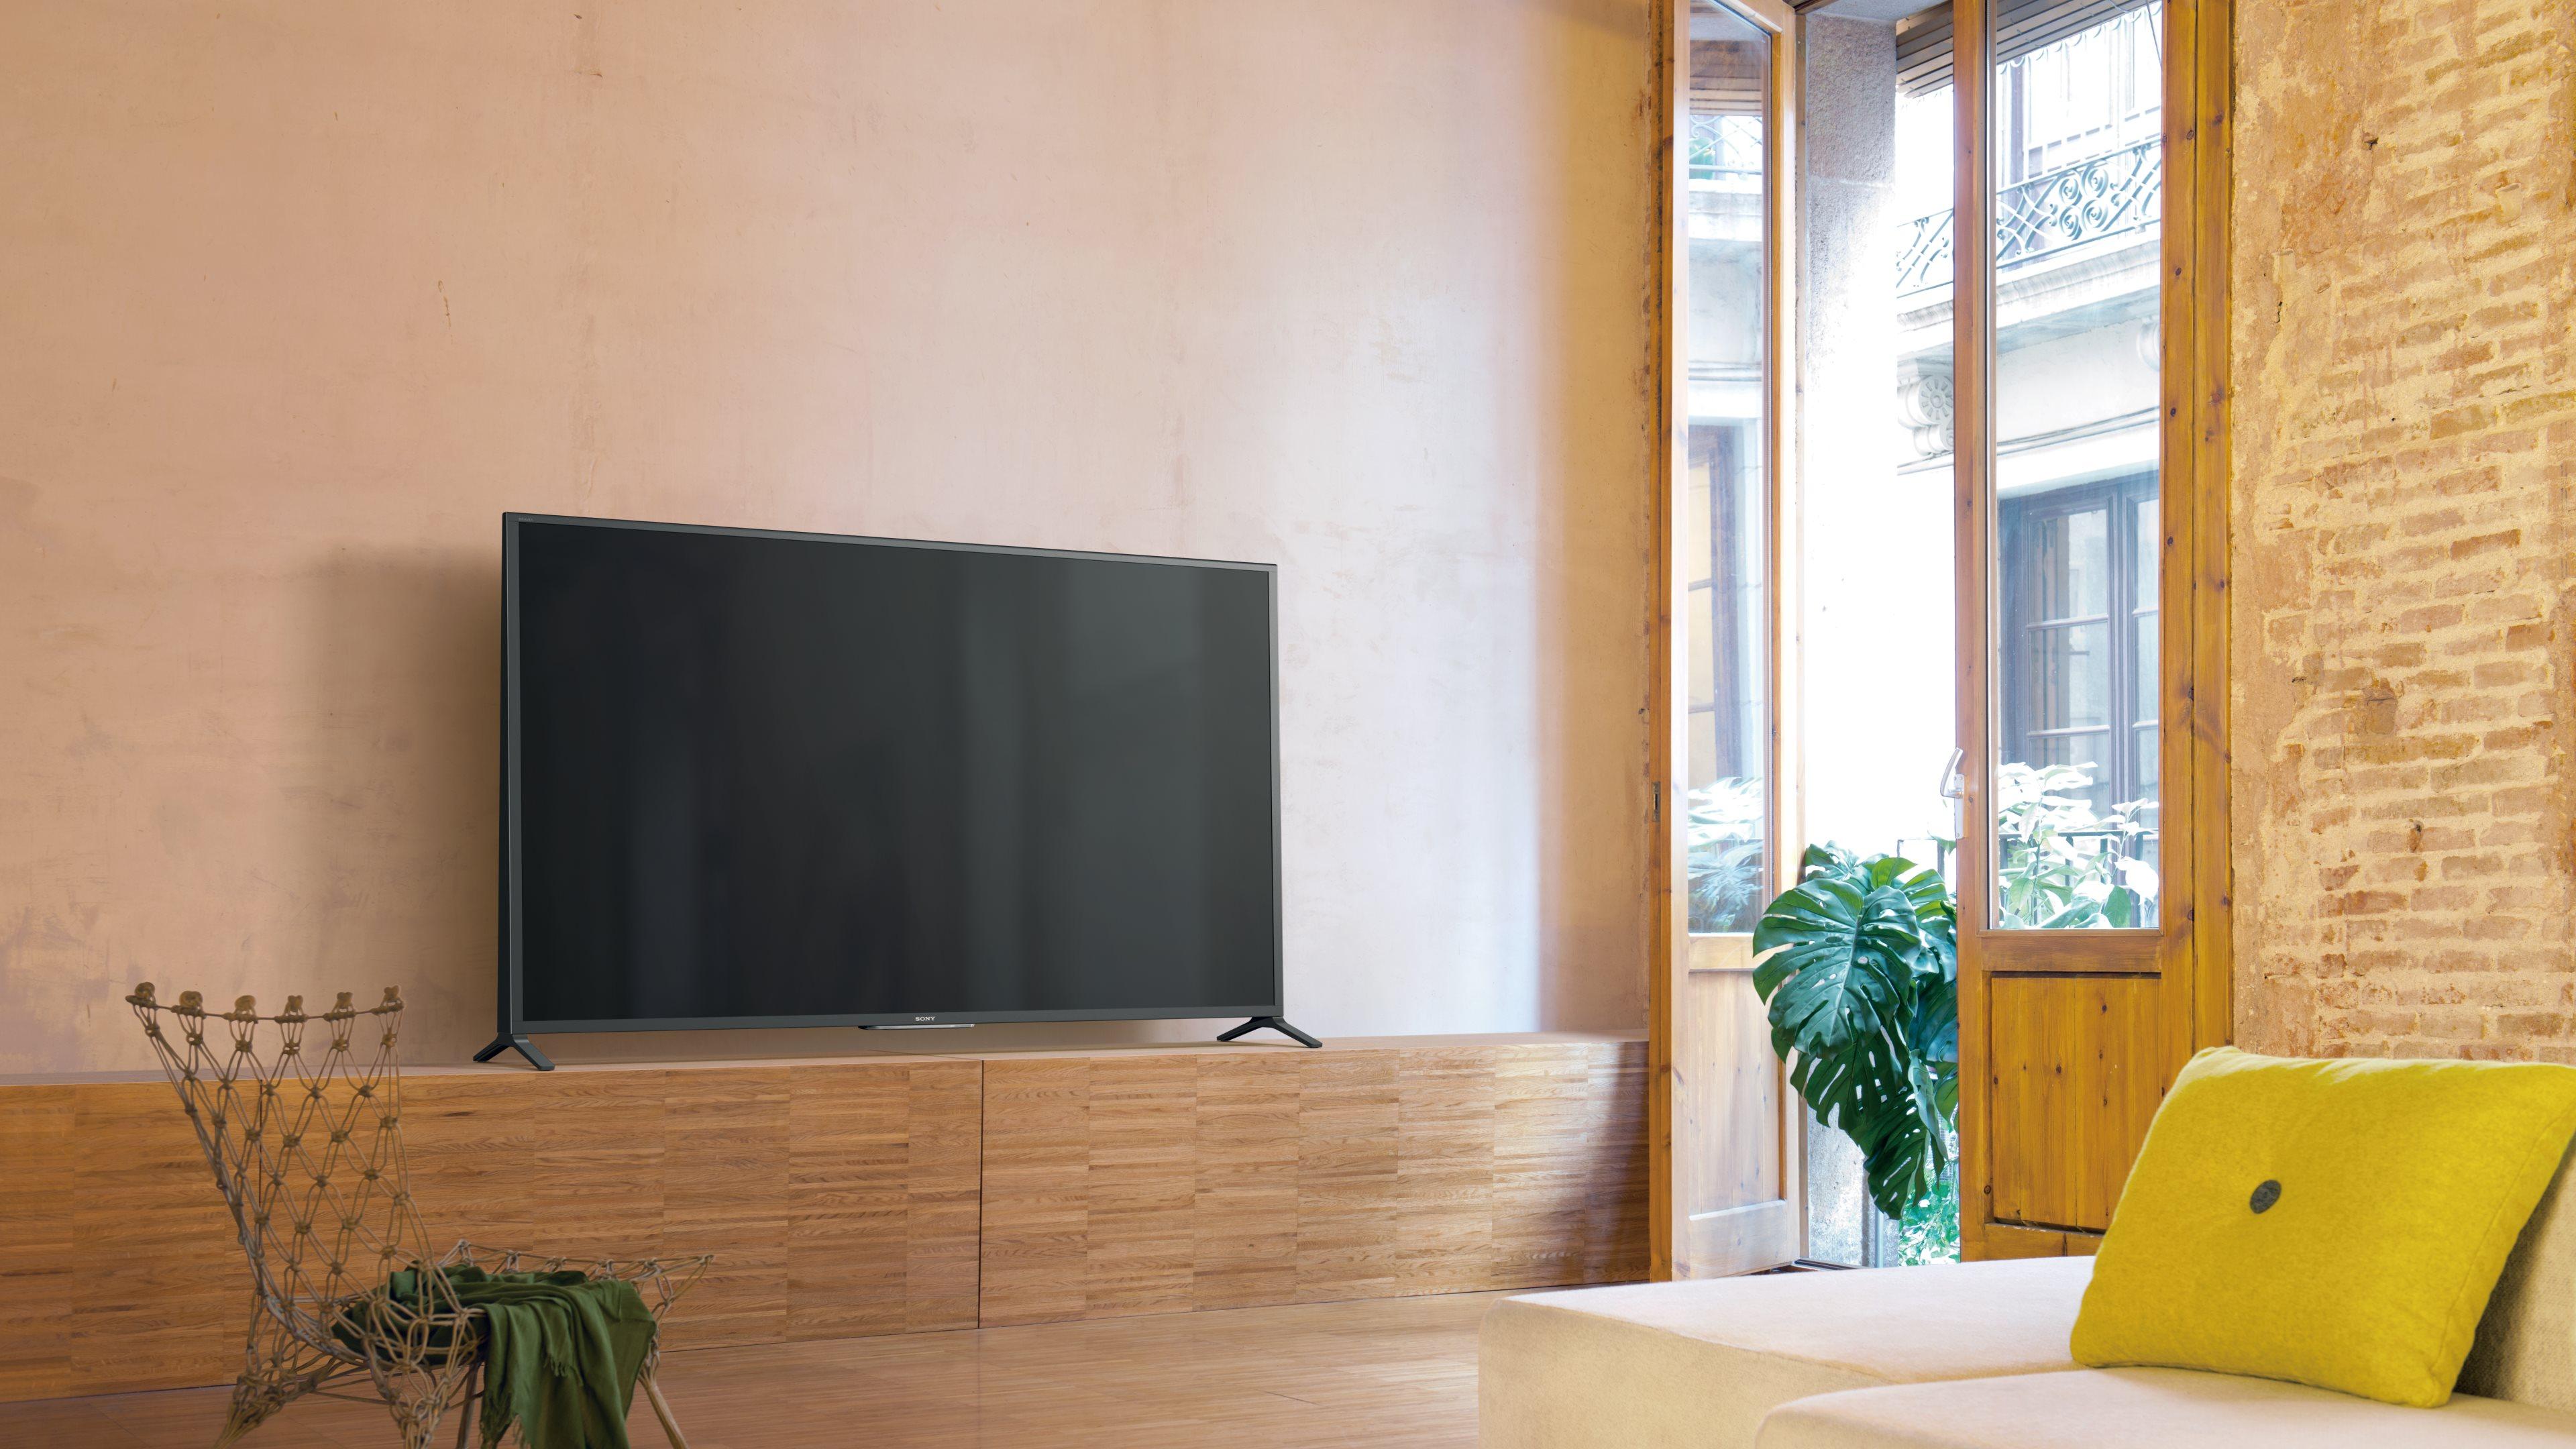 Wallpaper: Sony 4K UHD BRAVIA 2014 In Living Room. Ultra HD 4K 3840x2160 Part 76